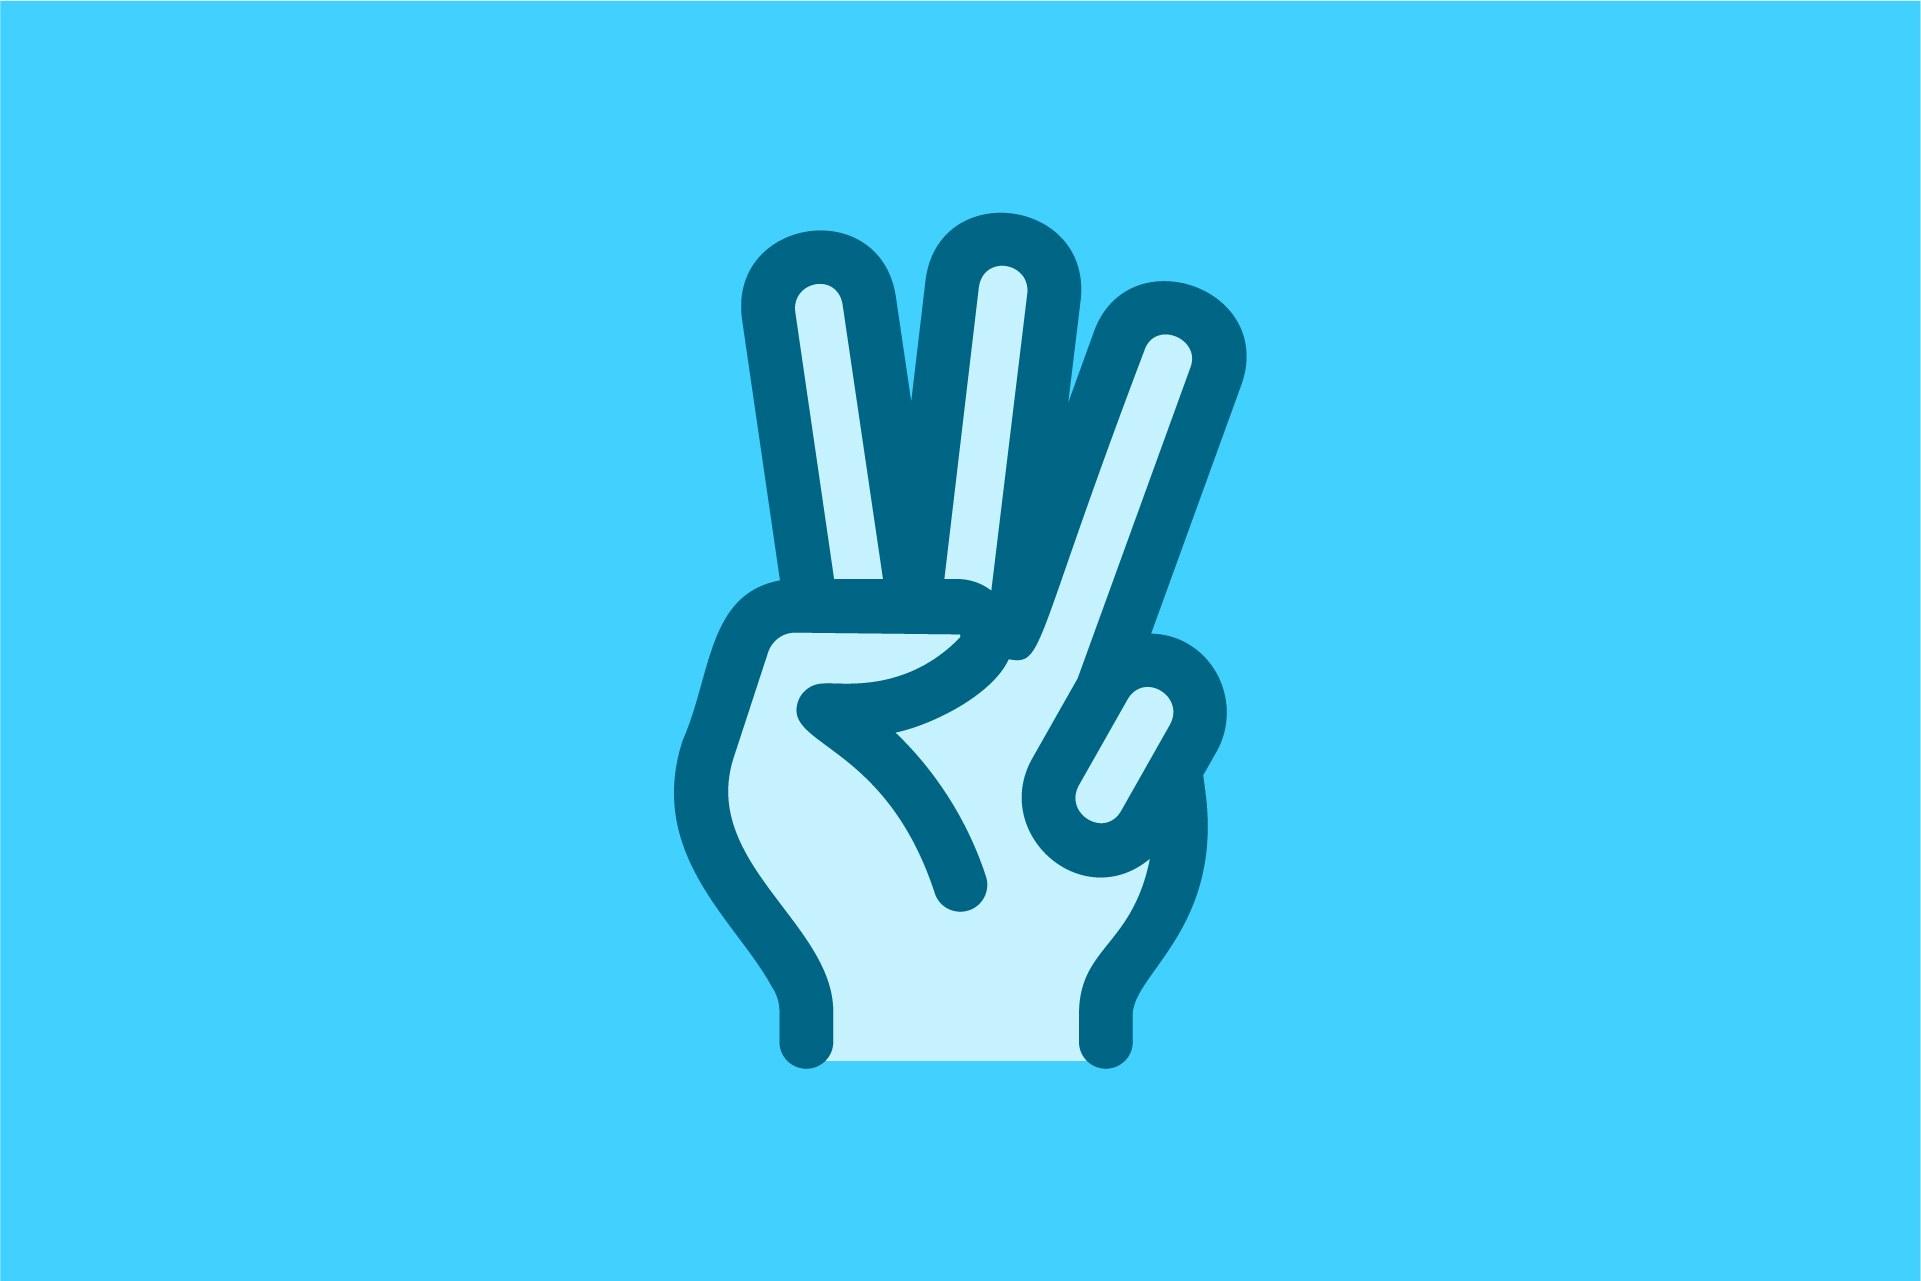 3 fingers cartoon